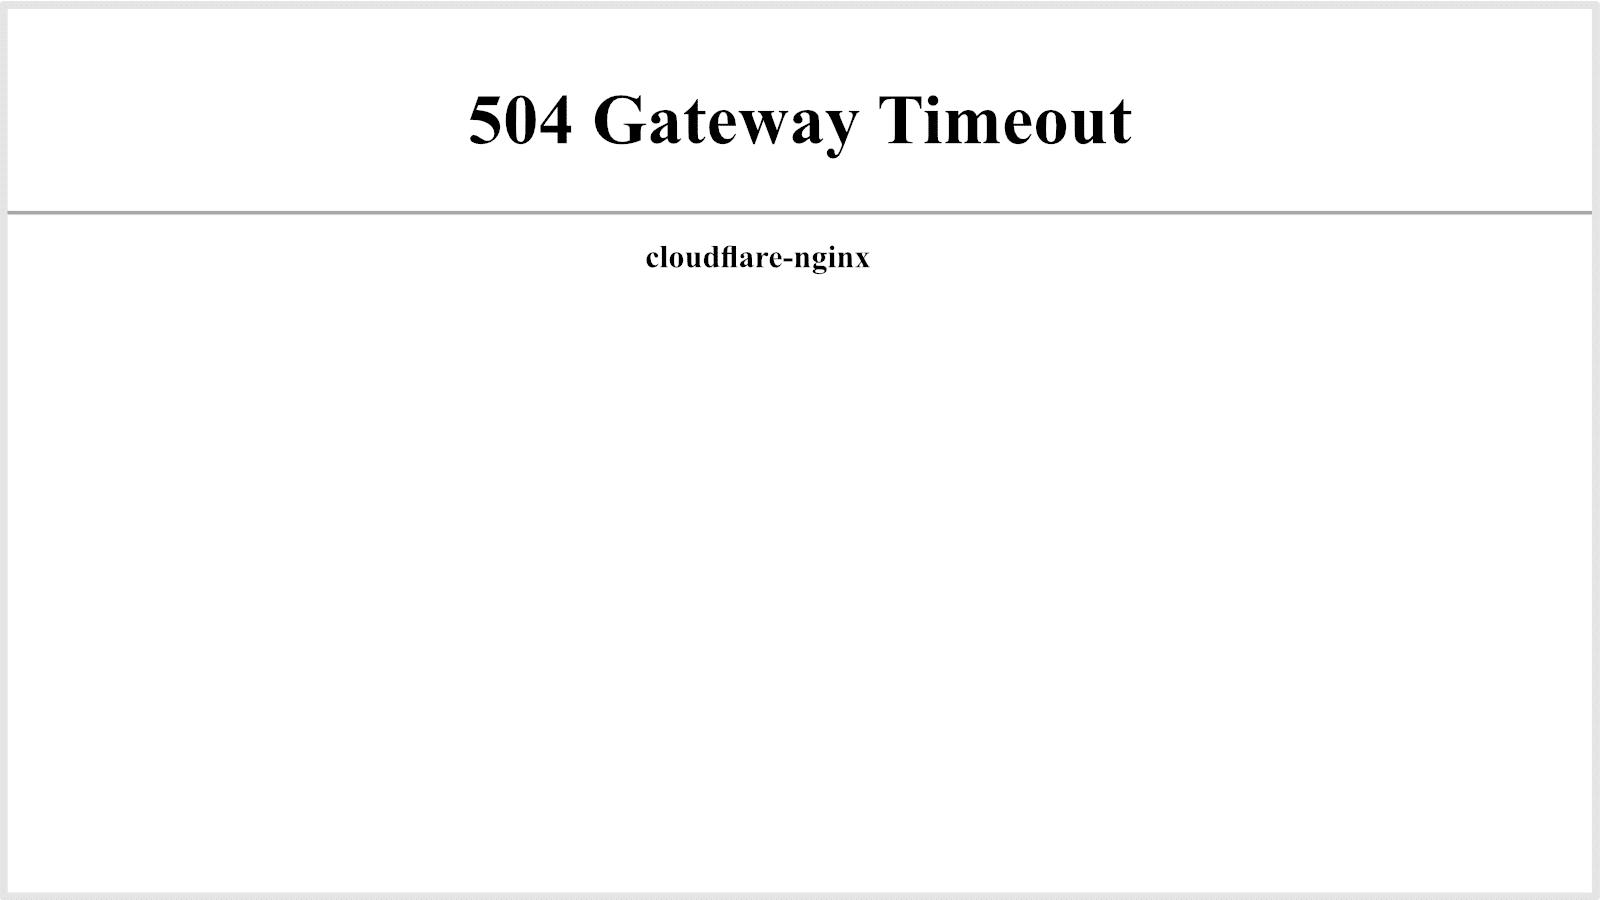 504 gateway timeout di Cloudflare